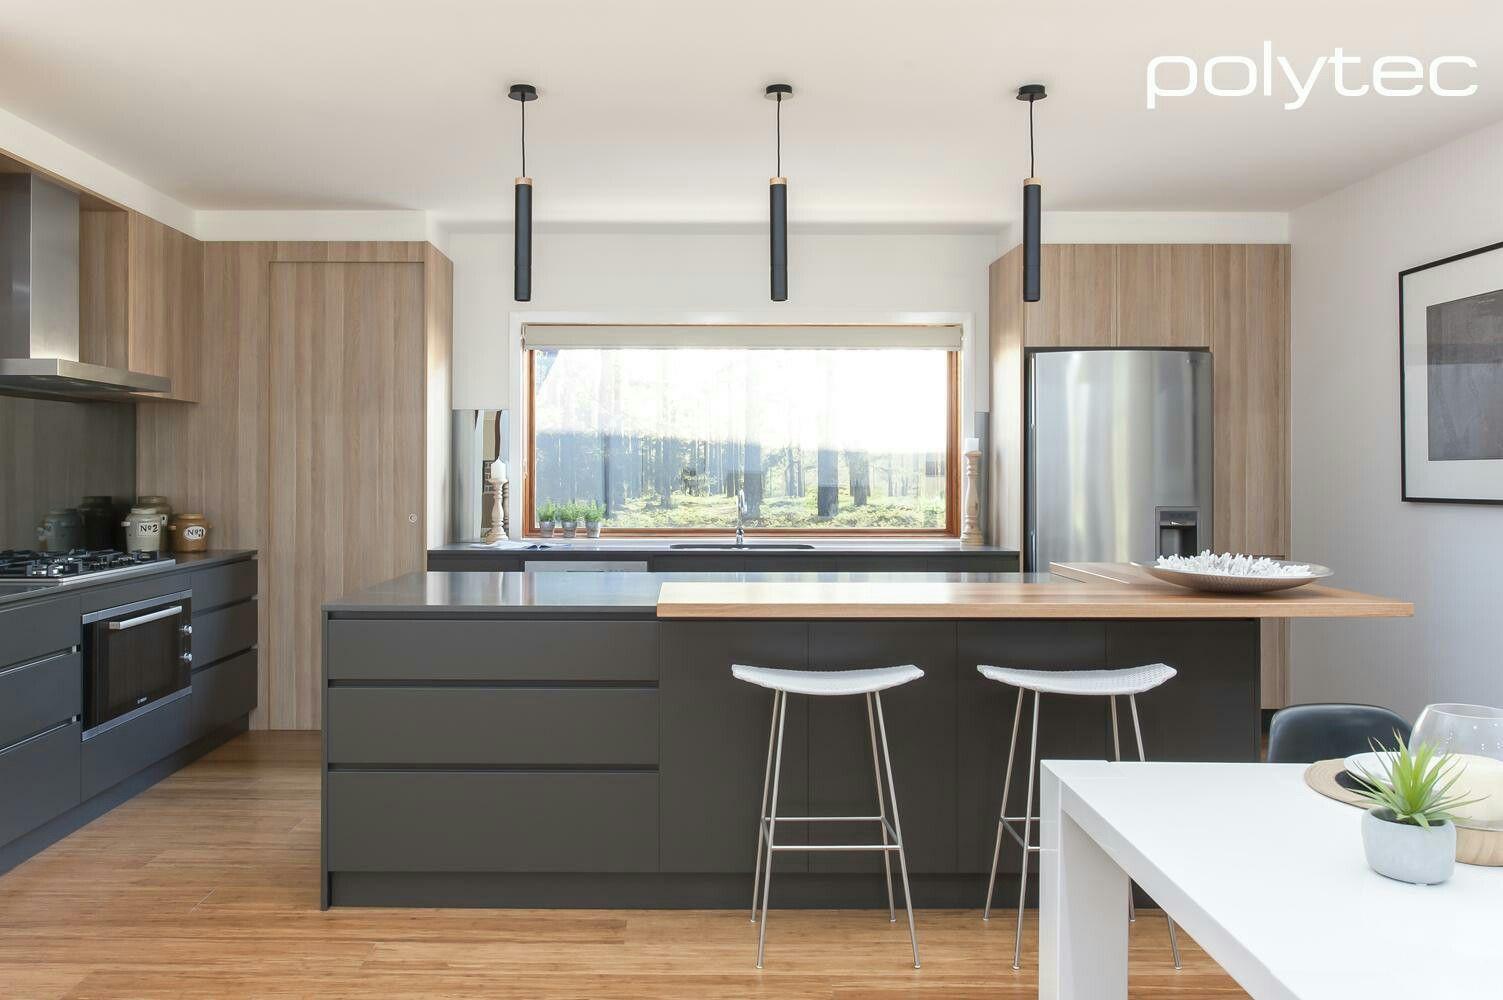 Polytec Cinder Matt Kitchen Design Small Home Decor